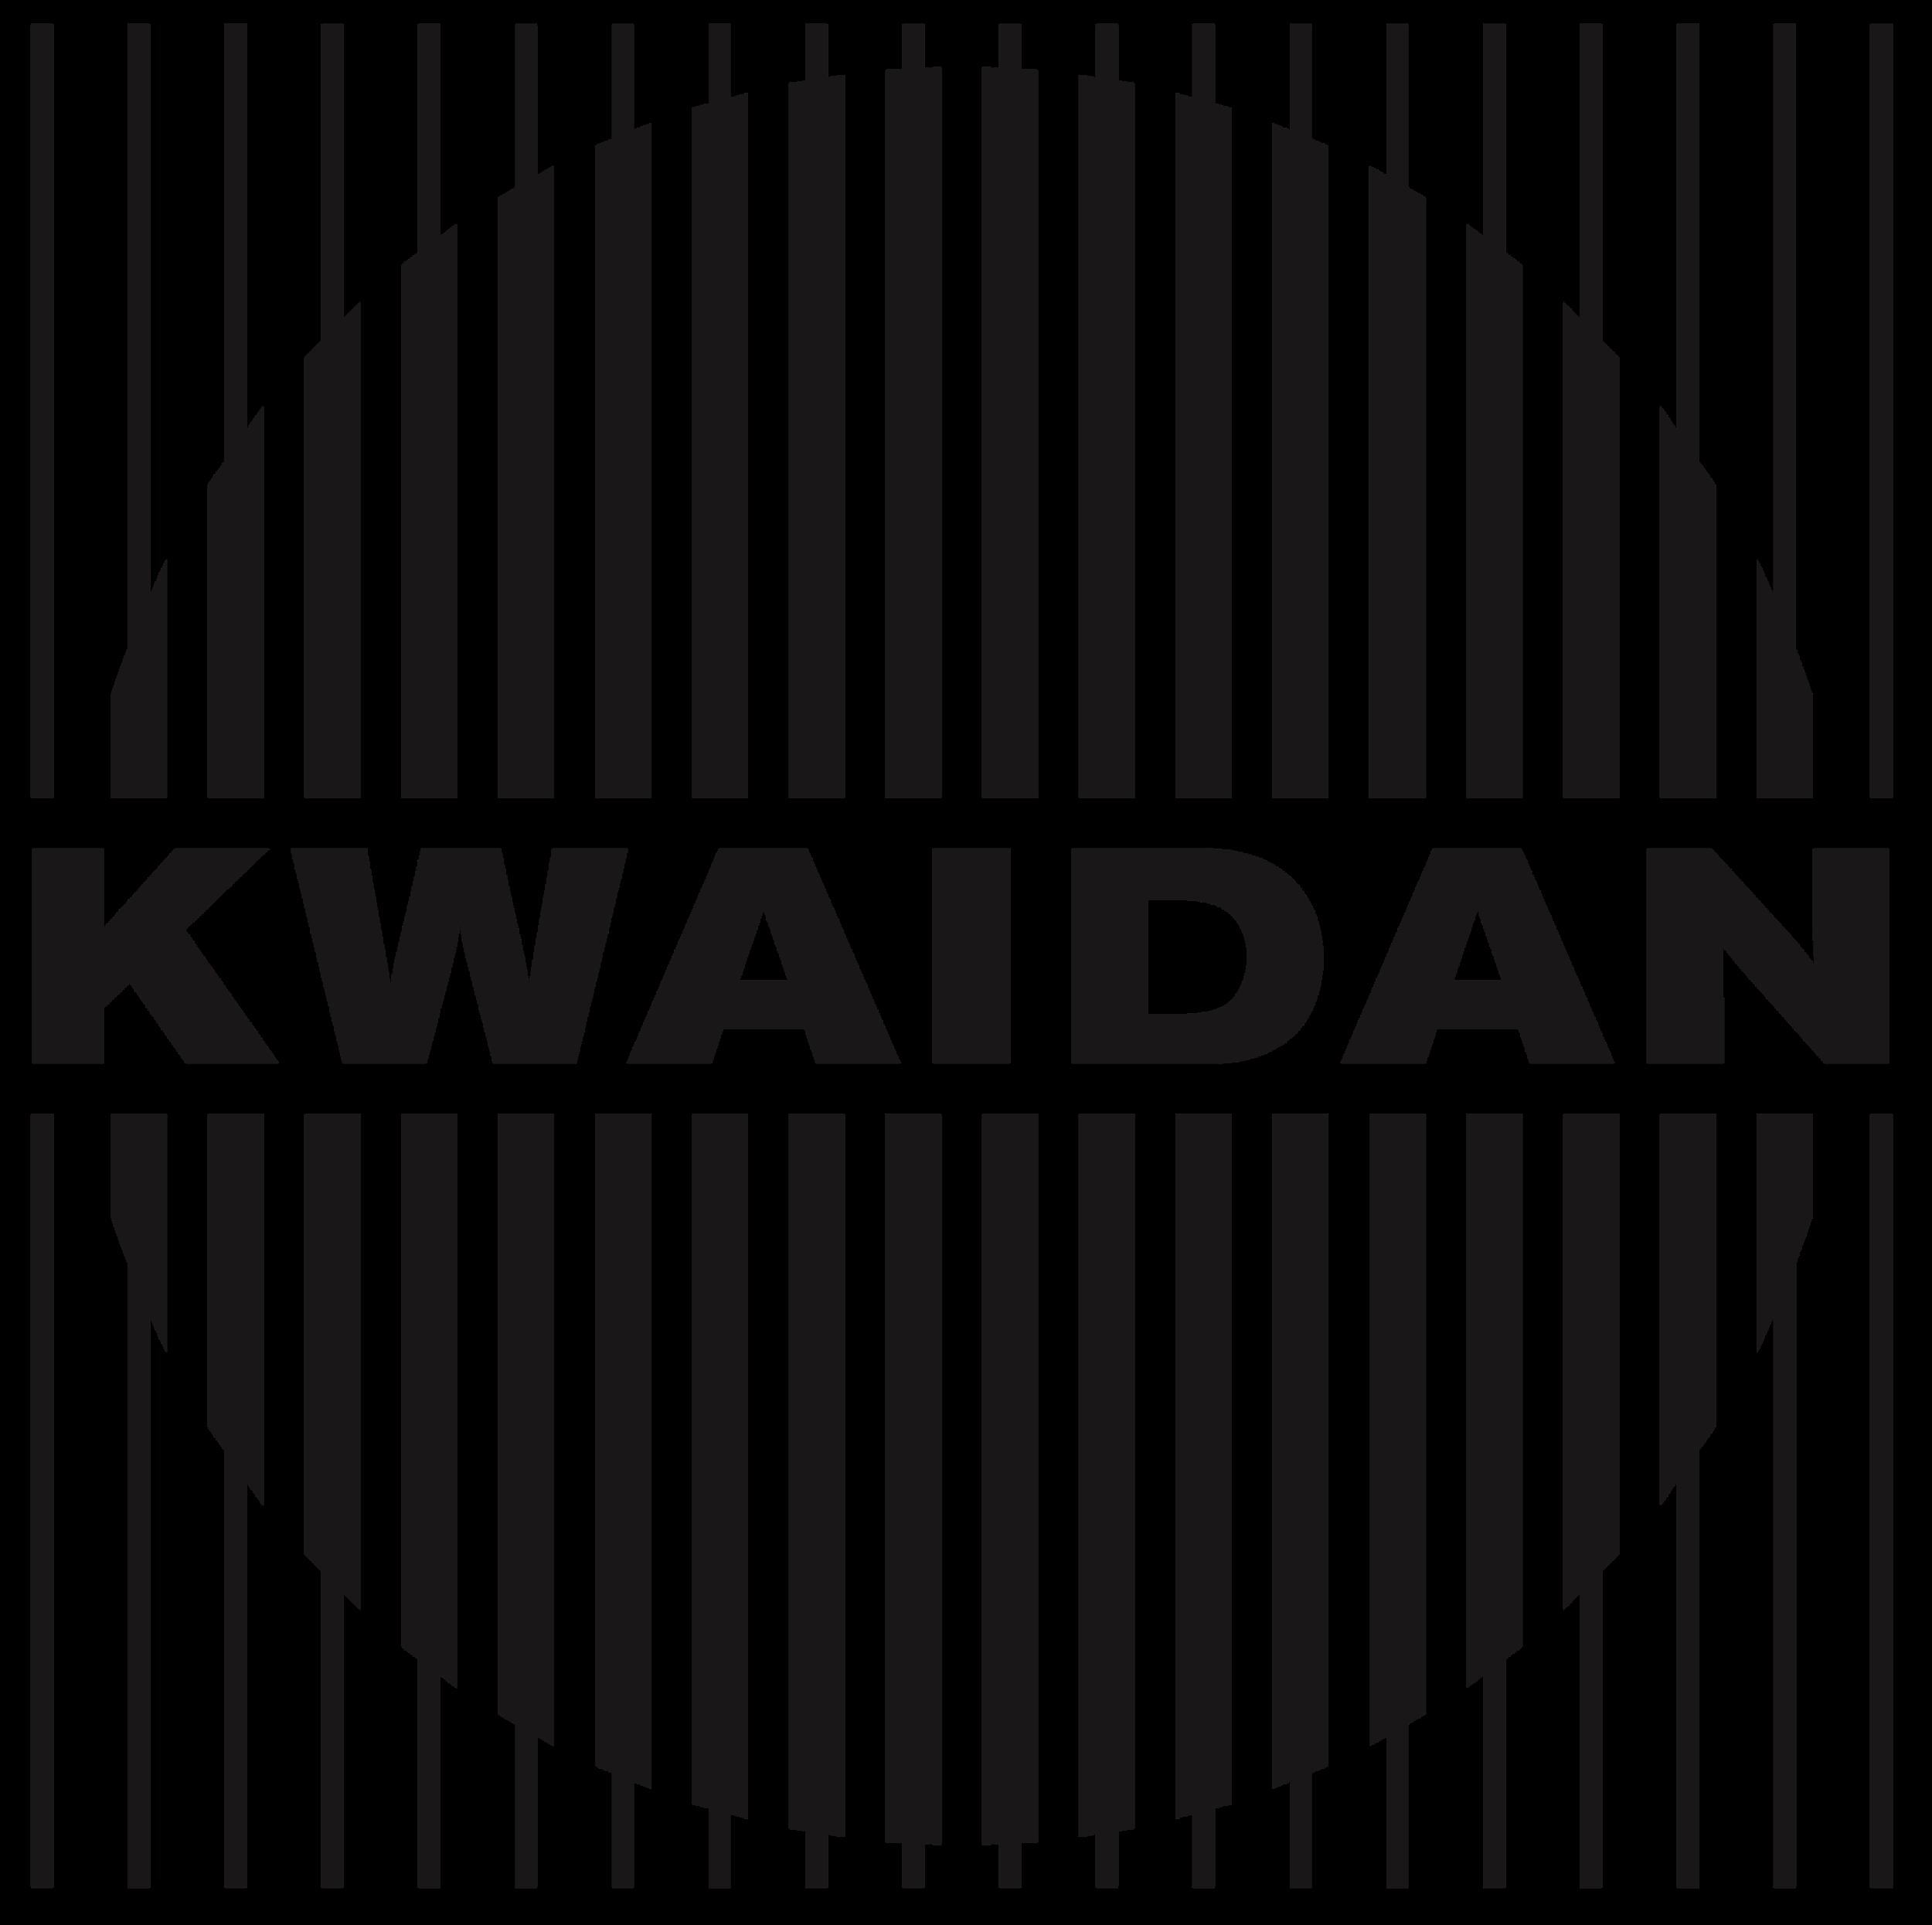 Kwaidan logo SQUARESPACE.png